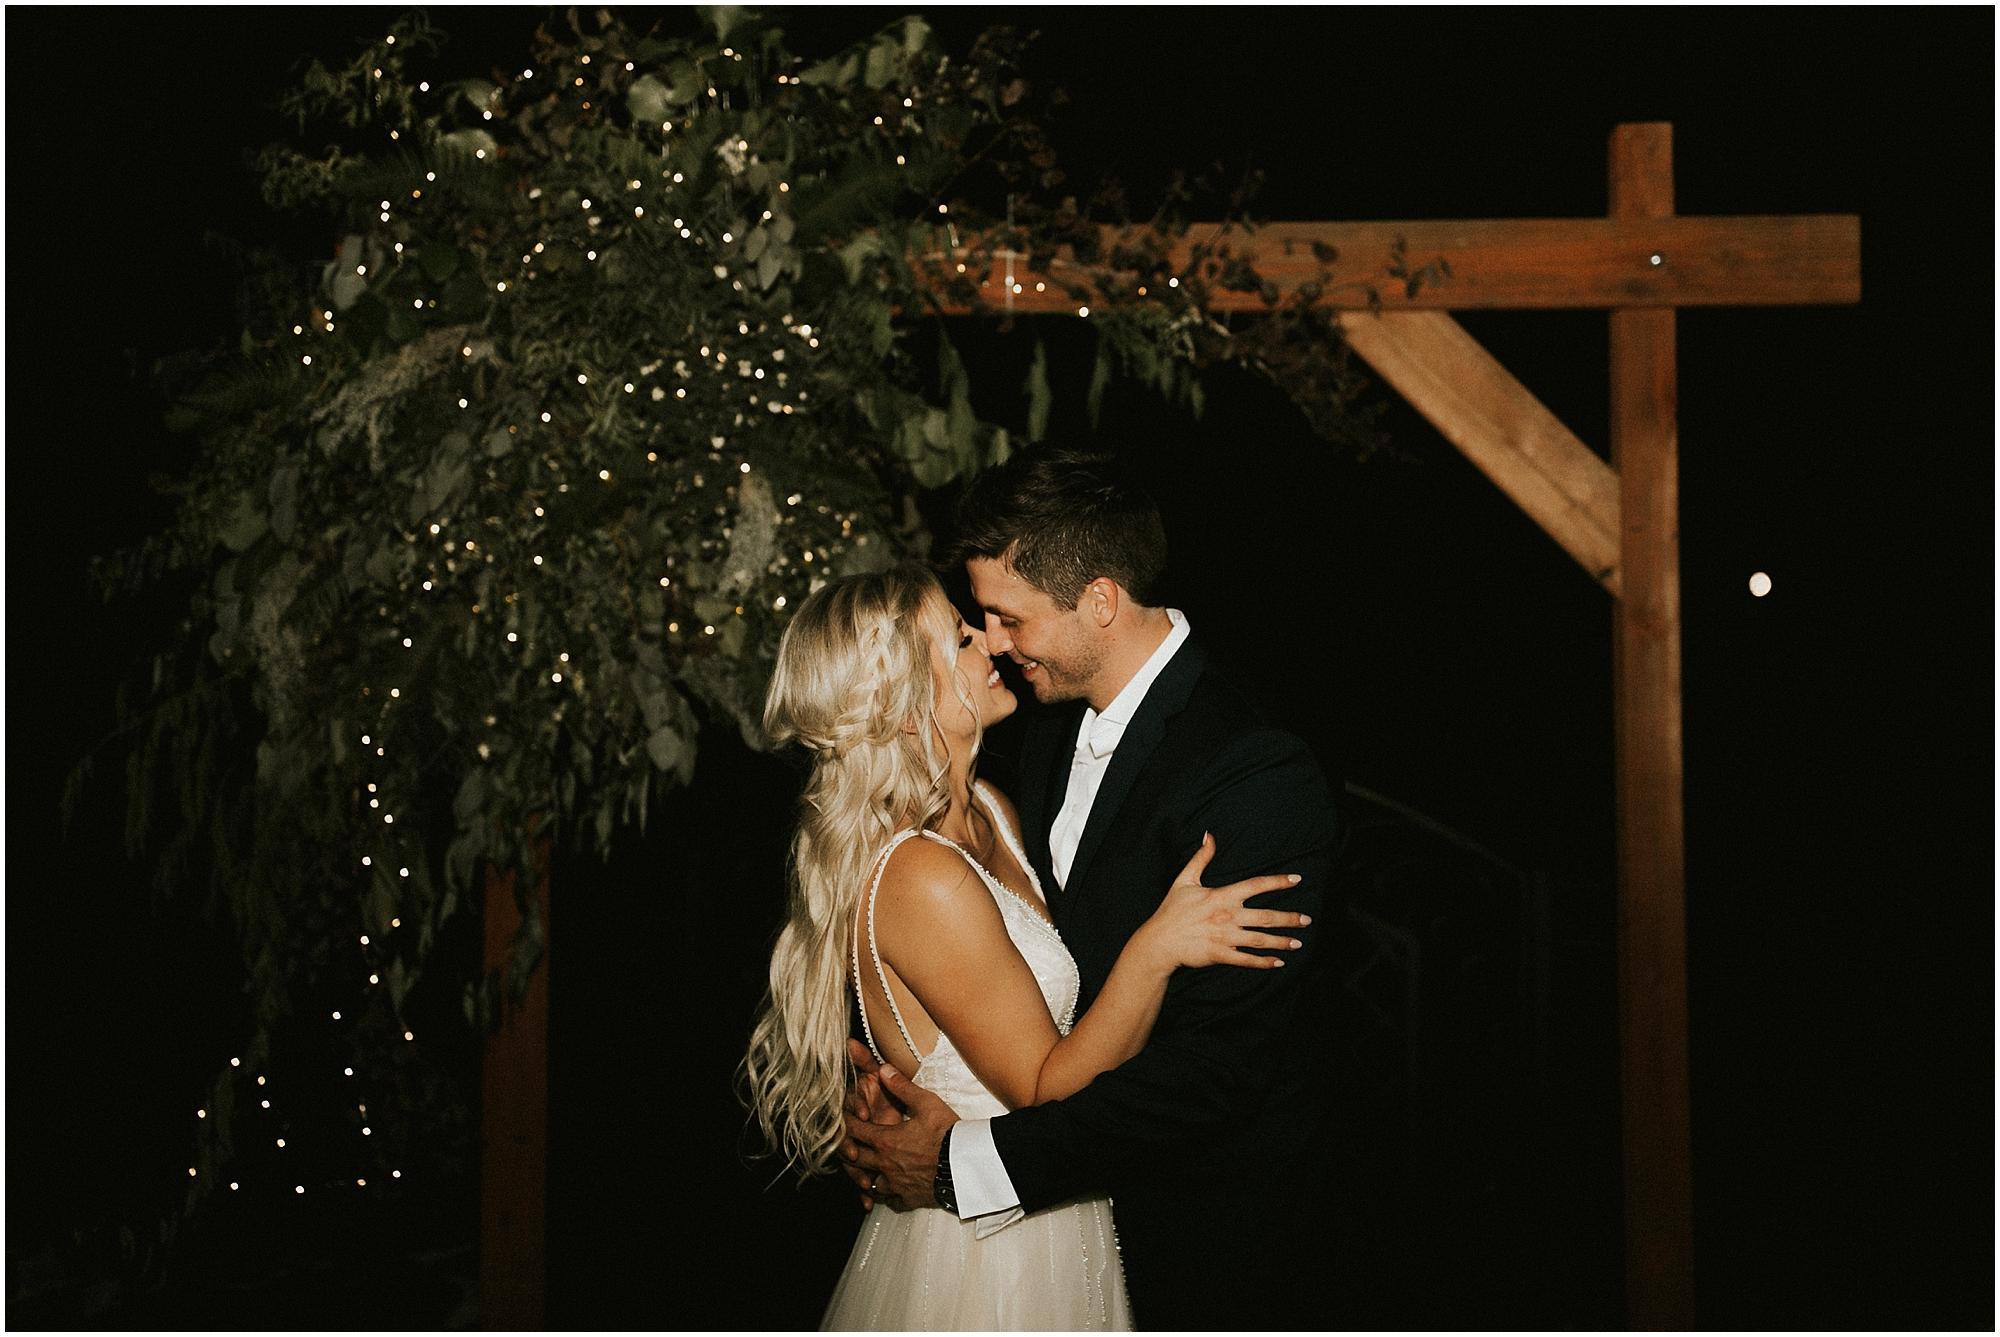 Chateau Rive Spokane Wedding Cassie Trottier Photography1164.jpg